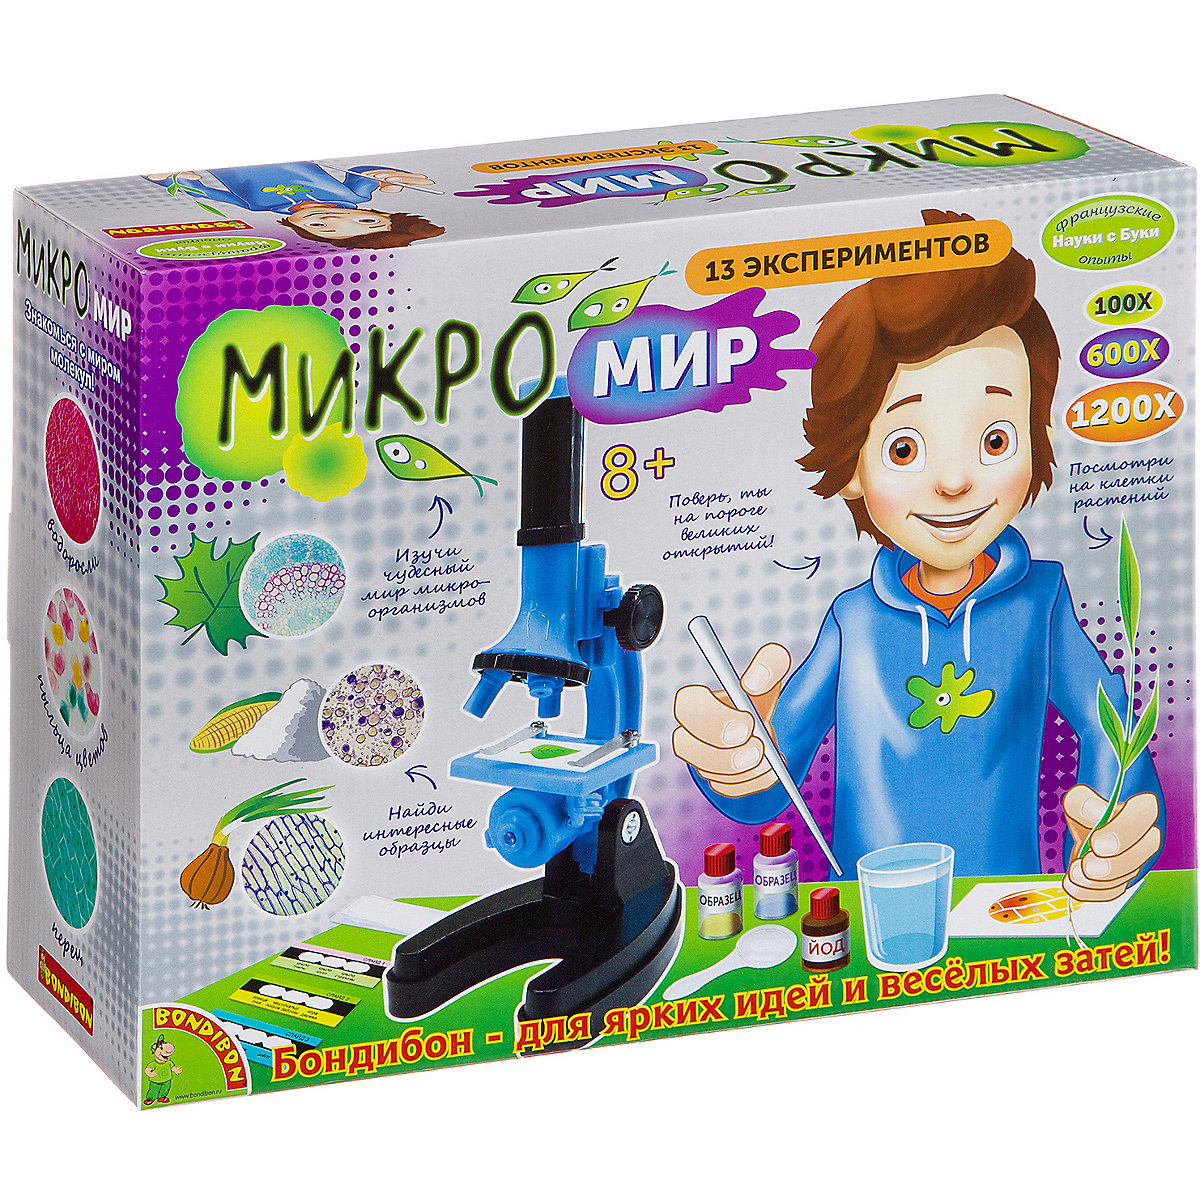 Bondibon Science 10367350 Experiments for children Educational toys Training toy Learning & Education MTpromo цены